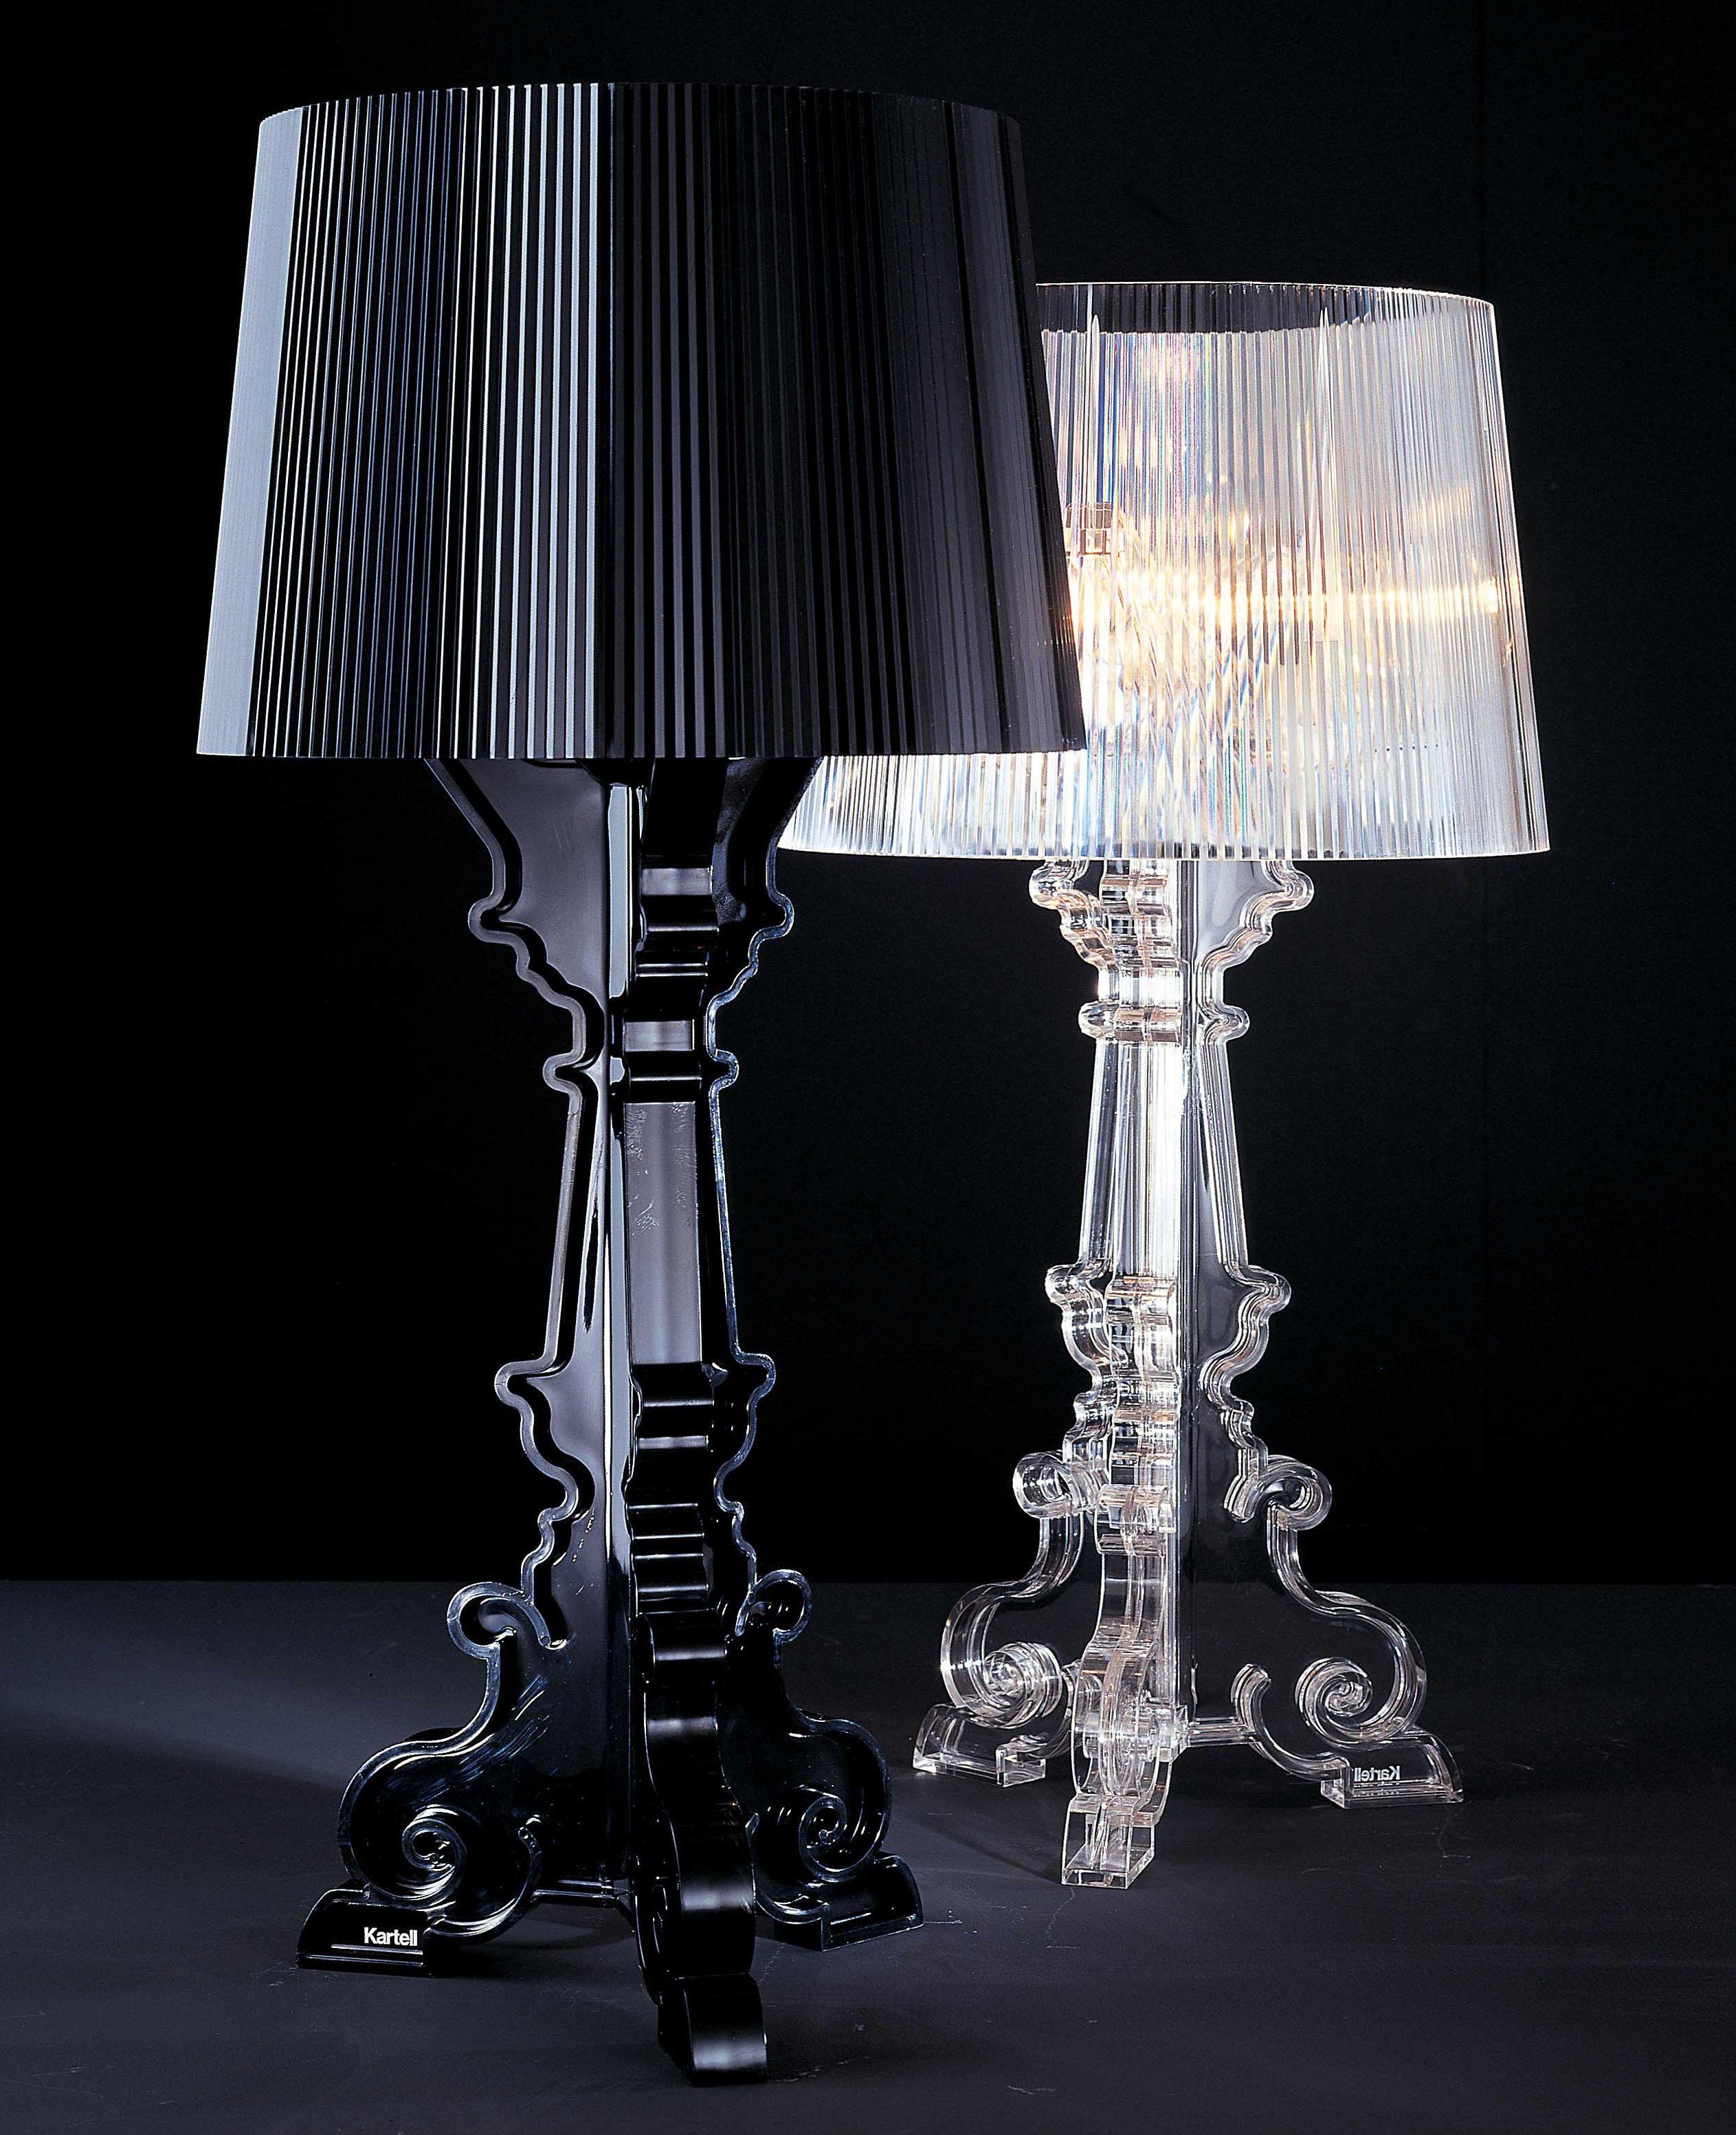 Lampe De Table Bourgie Kartell Noir Made In Design Lampe Kartell Lampes De Table Lampe De Chevet Design